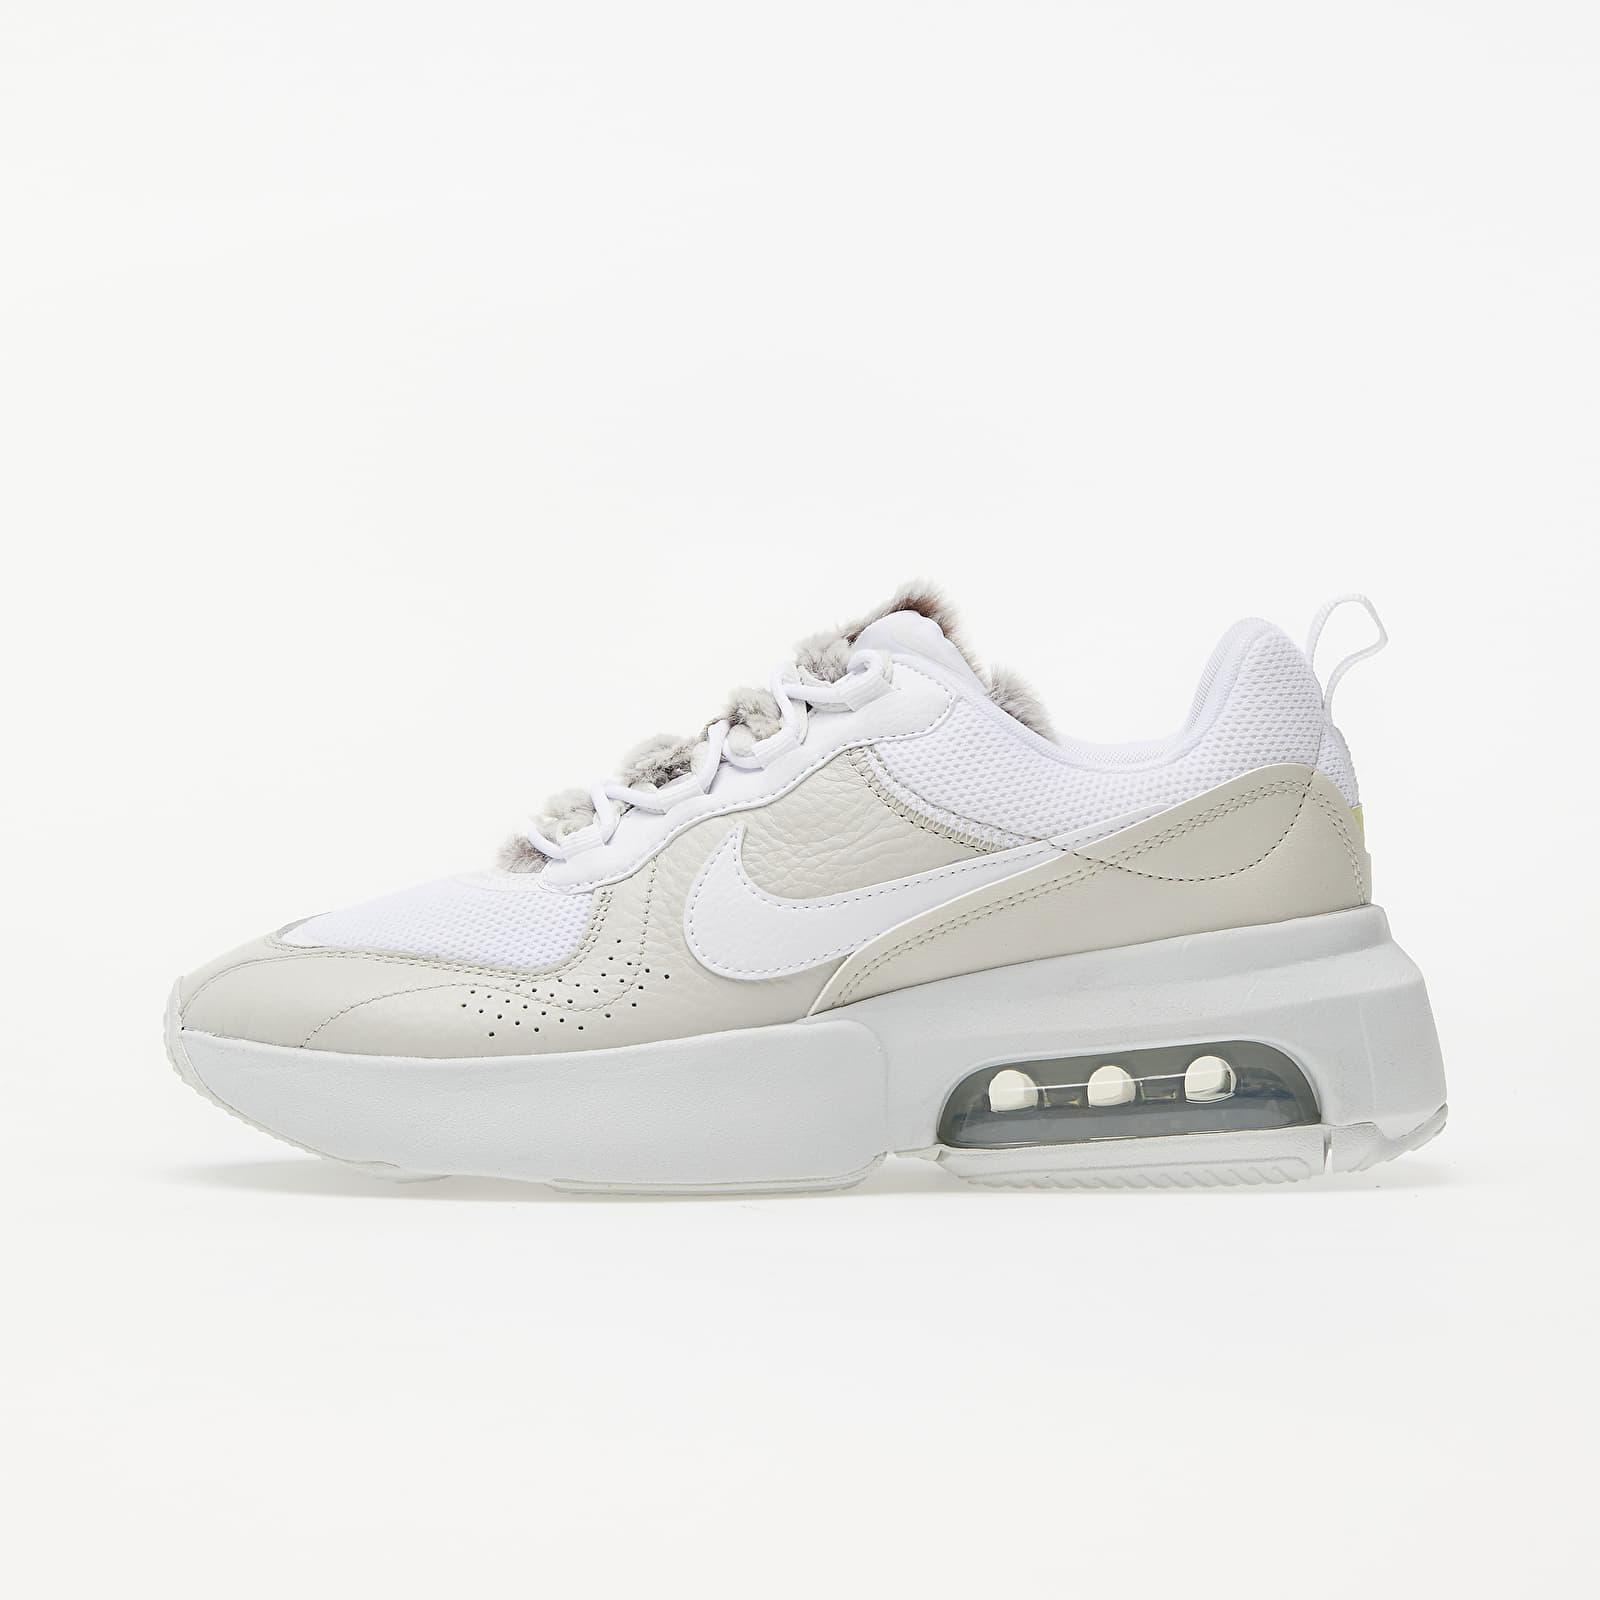 Nike Wmns Air Max Verona Light Bone/ White-Photon Dust-Life Lime DC1166-001